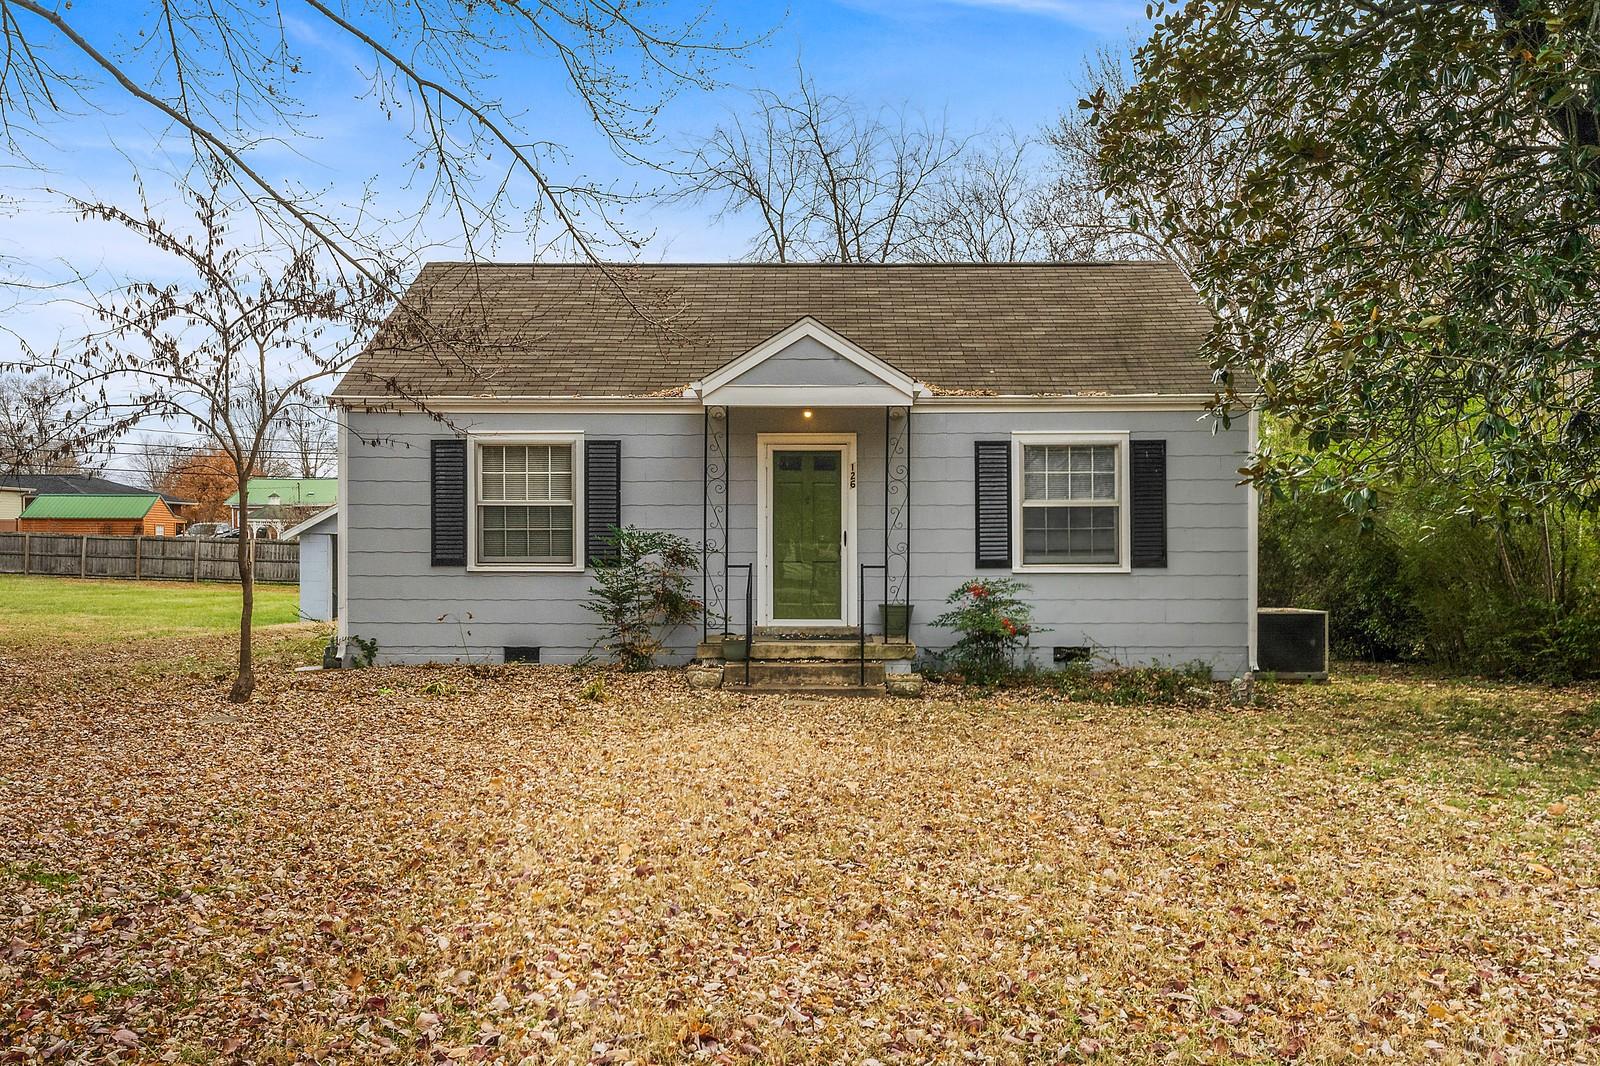 126 Brentlawn Dr, Springfield, TN 37172 - Springfield, TN real estate listing